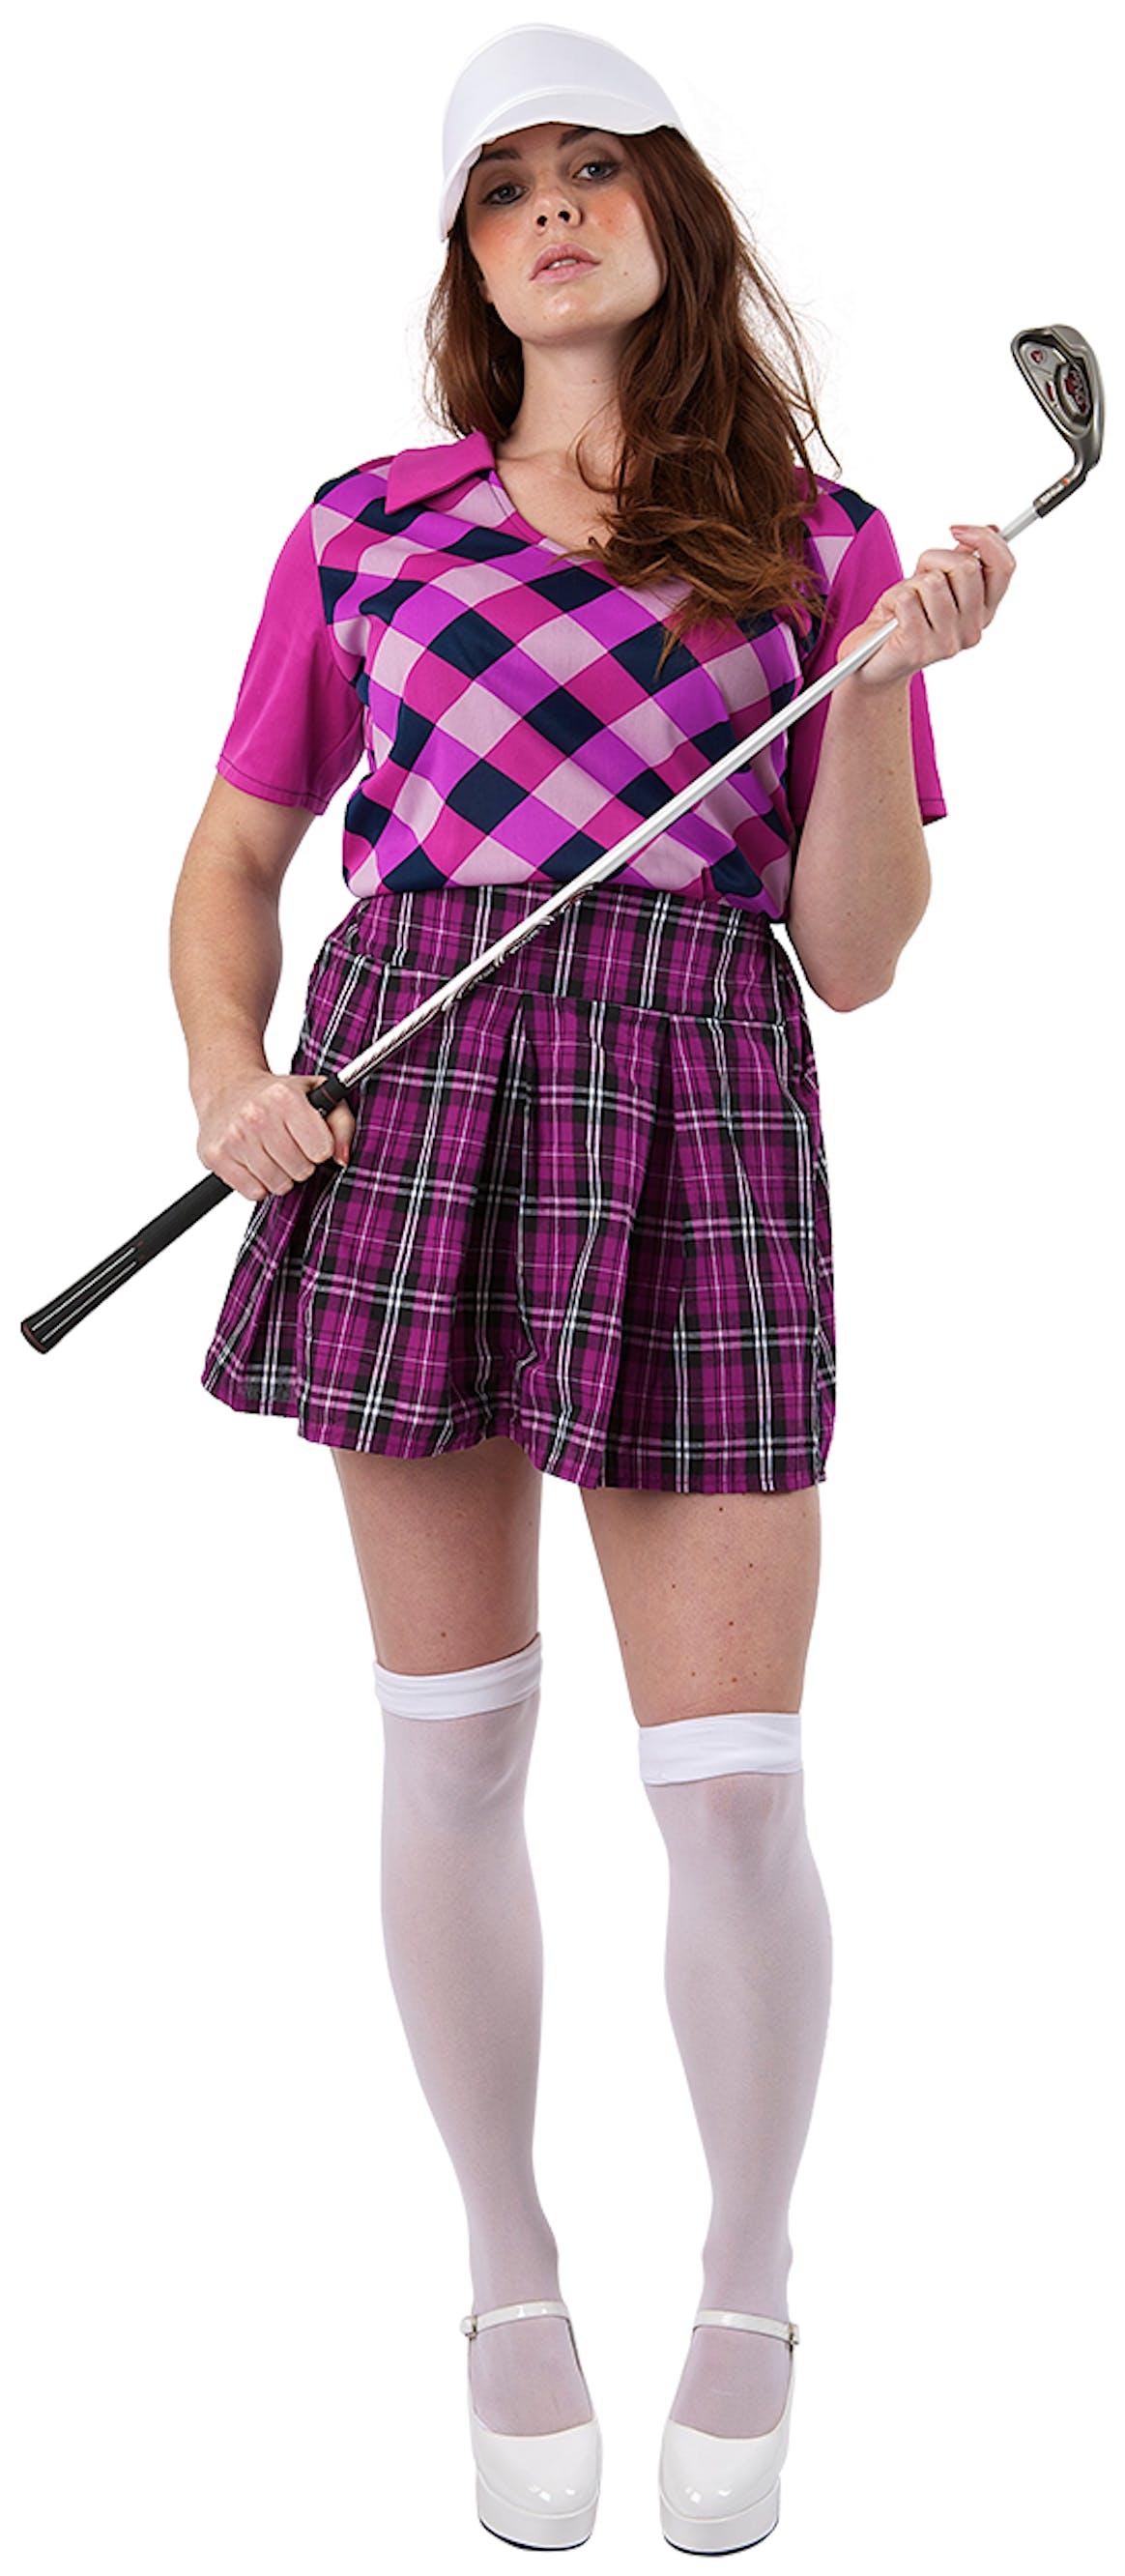 Womens Pub Golf Costume - Pink